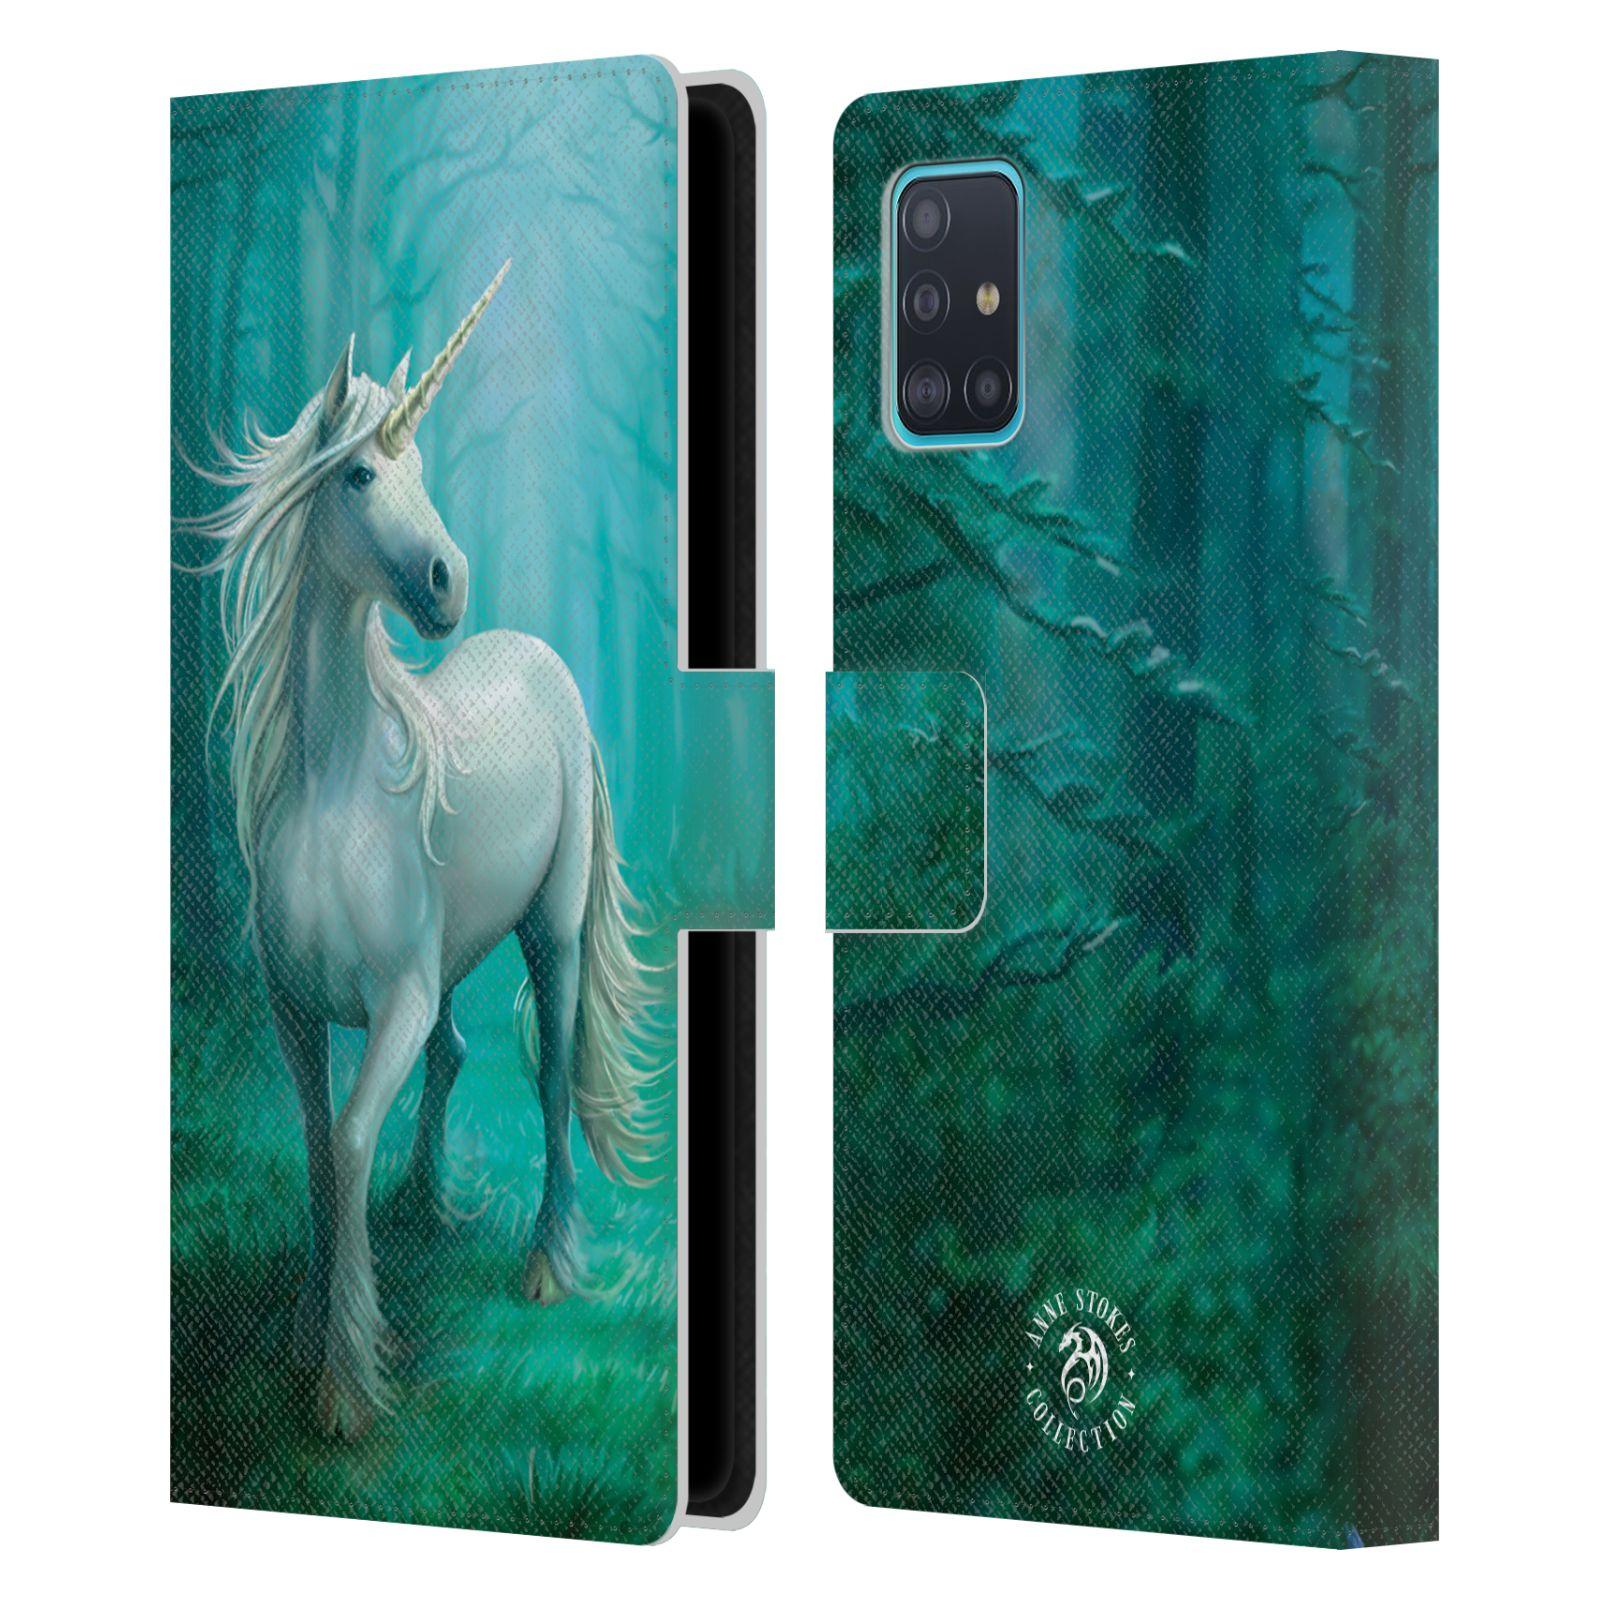 Pouzdro na mobil Samsung Galaxy A51 (A515F) - Head Case - fantasy - jednorožec v lese